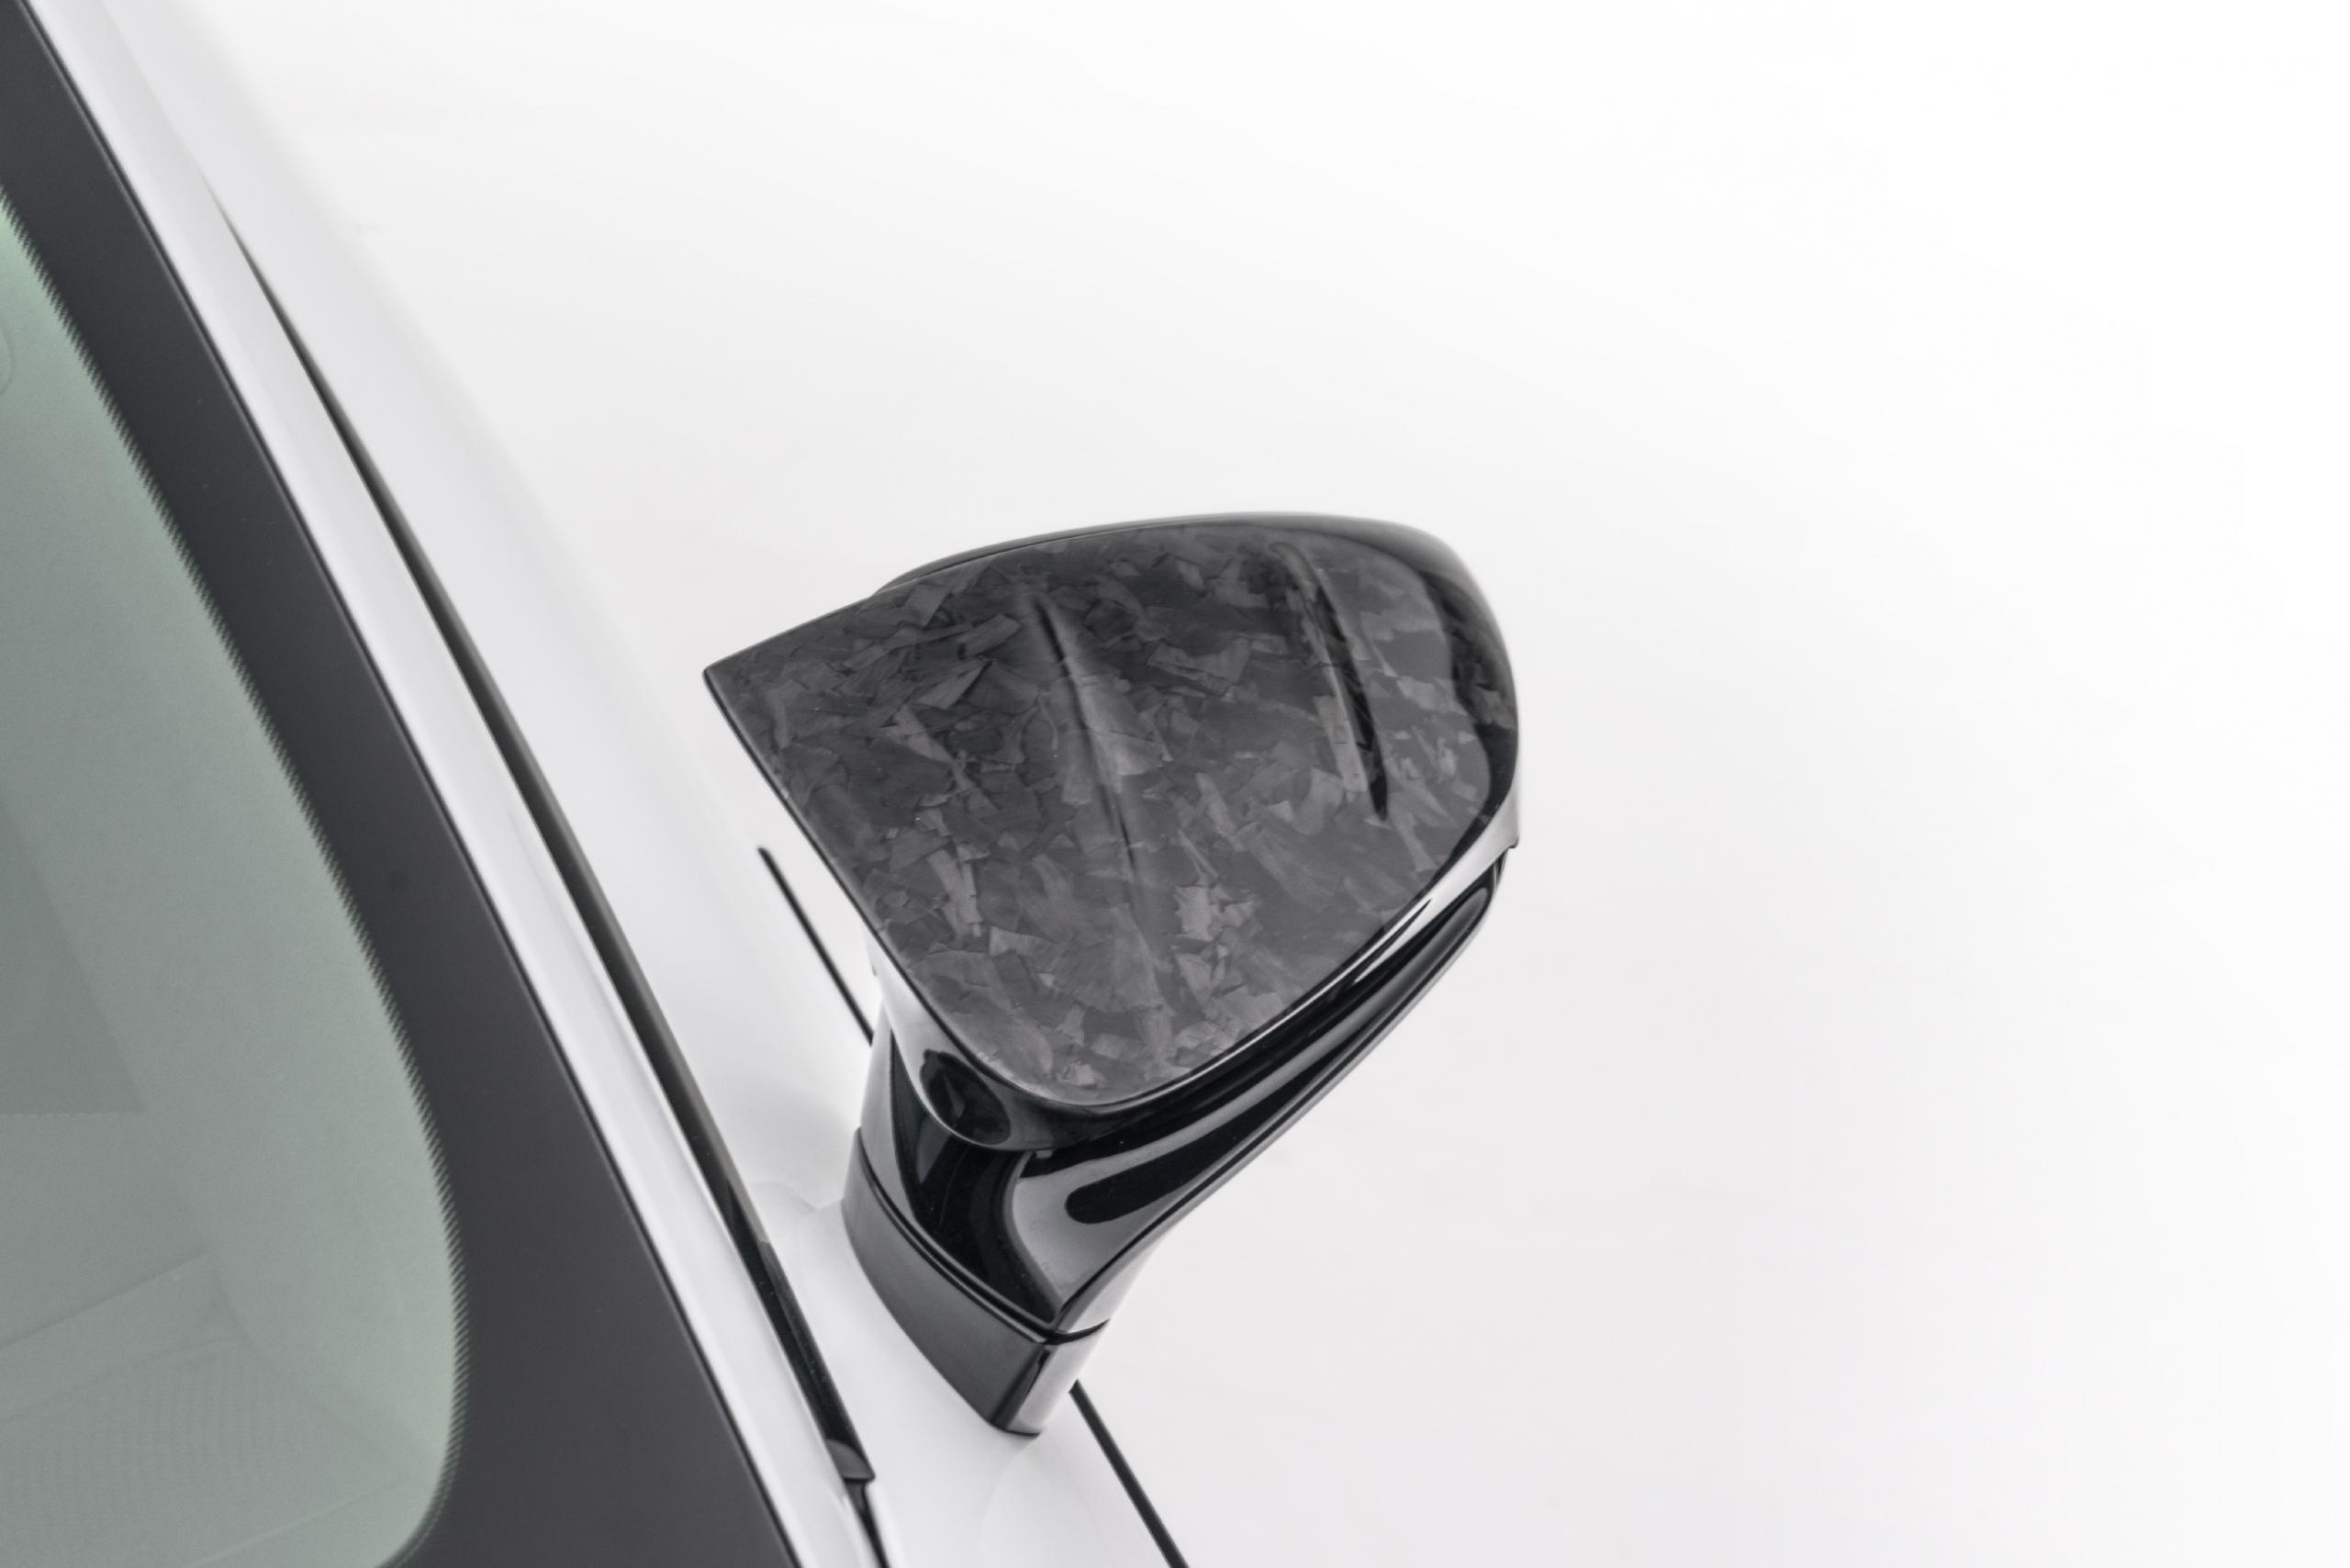 mansory porsche taycan carbon fiber body kit mirror cover top 2020 2021